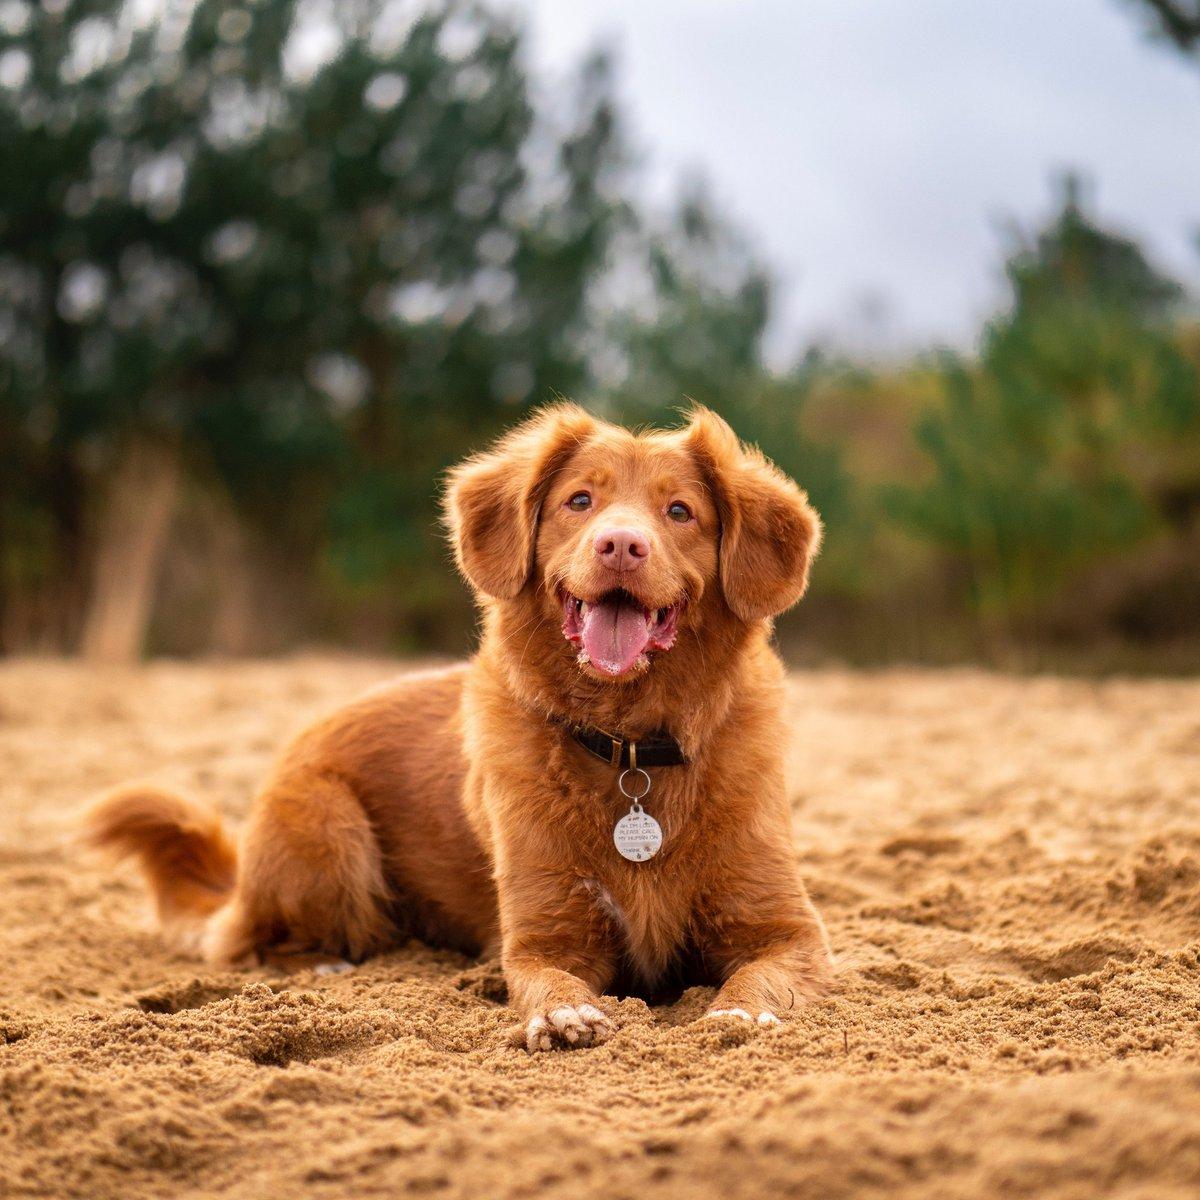 Morning ❤️🤗  #dogsofinstagram #dogs_of_instagram #doglover #doglife #instapup #dogstagram #doglove #dogsarefamily #dogfriends #dogsoftheday #dog #dogs #dogoftheday #instadog #puppy #doglovers #ilovemydog #dogsofinsta #pet #puppylove #doggy #puppies #cute #dogsofig #doggo #pe